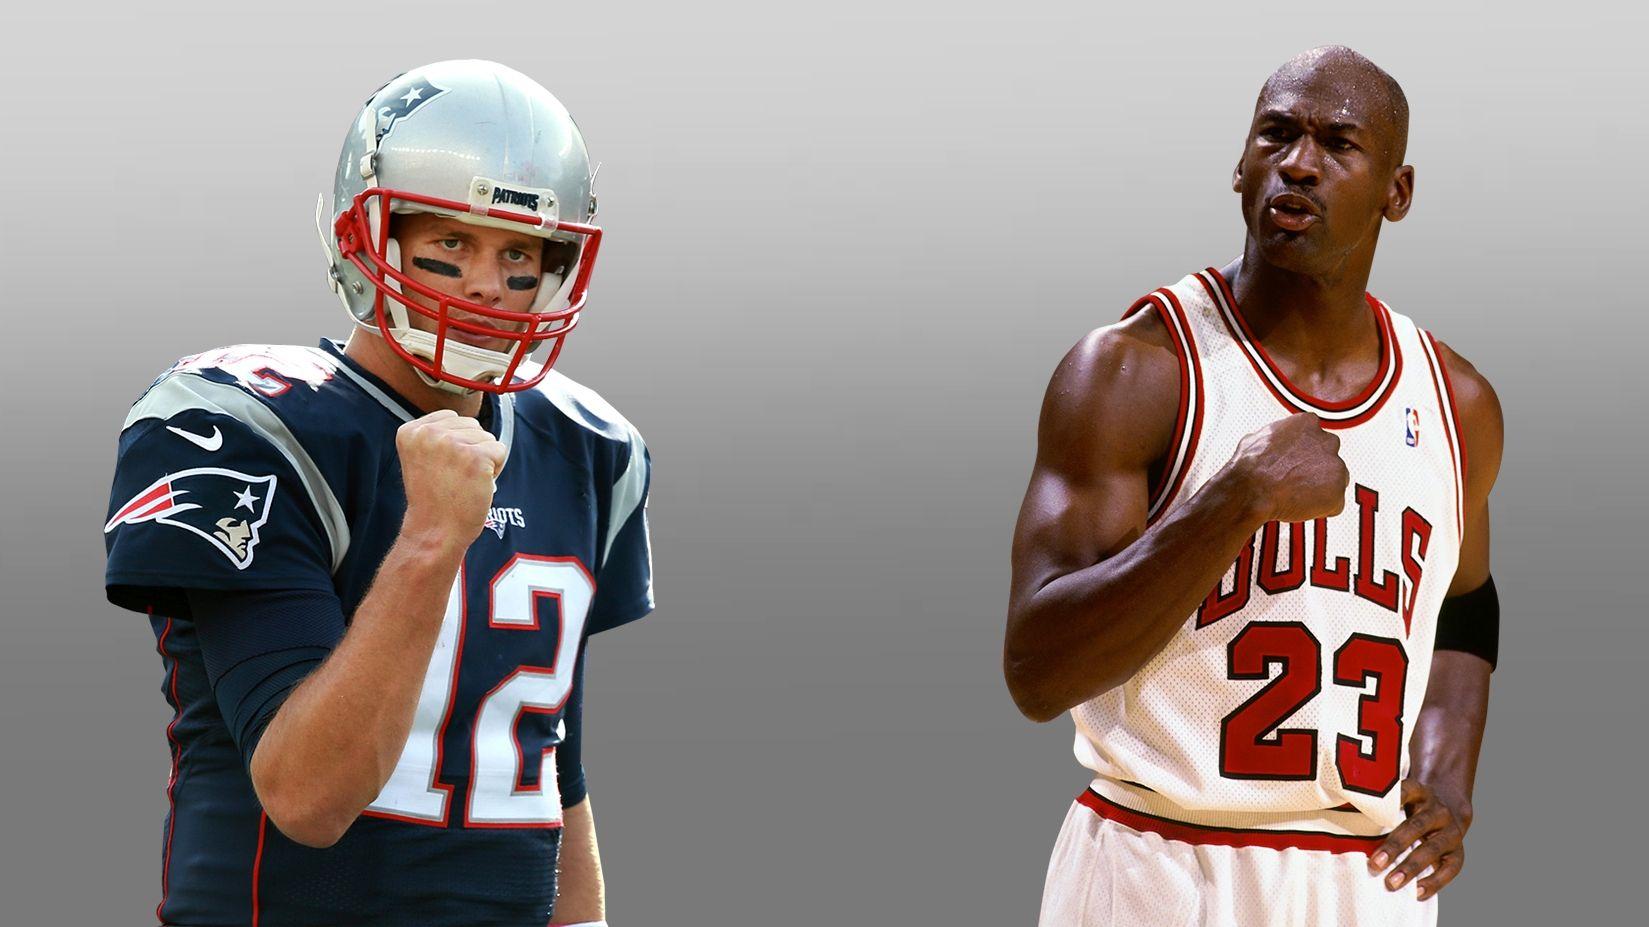 https://secure.espncdn.com/combiner/i?img=/media/motion/2018/0123/dm_180123_NFL_Brady_vs_Jordan_ENHANCED/dm_180123_NFL_Brady_vs_Jordan_ENHANCED.jpg